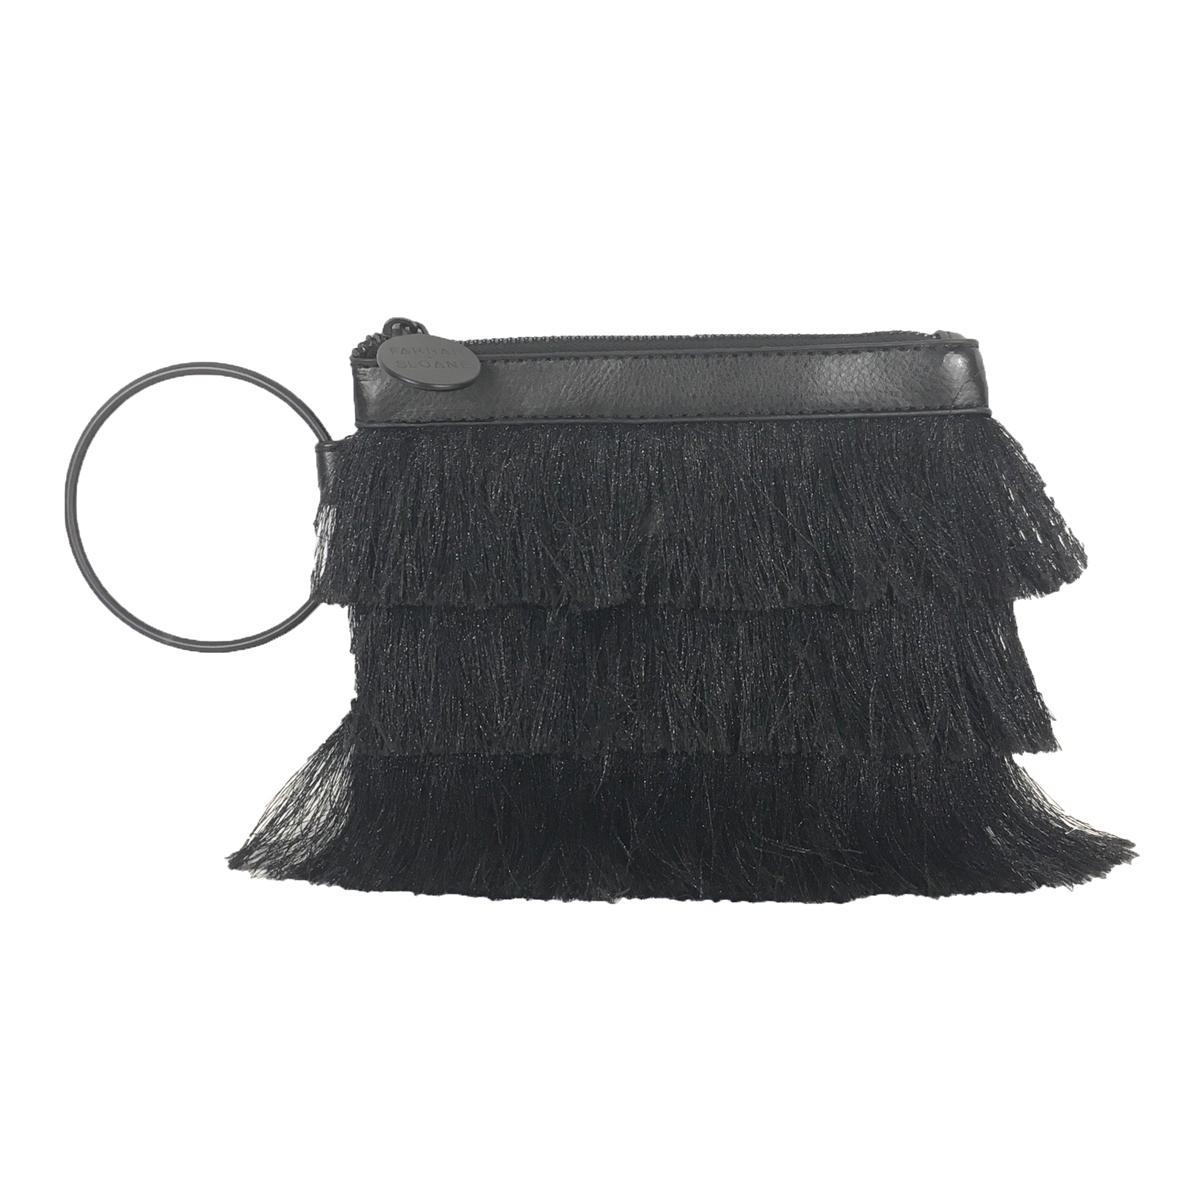 2a5333216c71 Farrah + Sloane Symi Metallic Fringe Wristlet Bracelet Clutch, Black